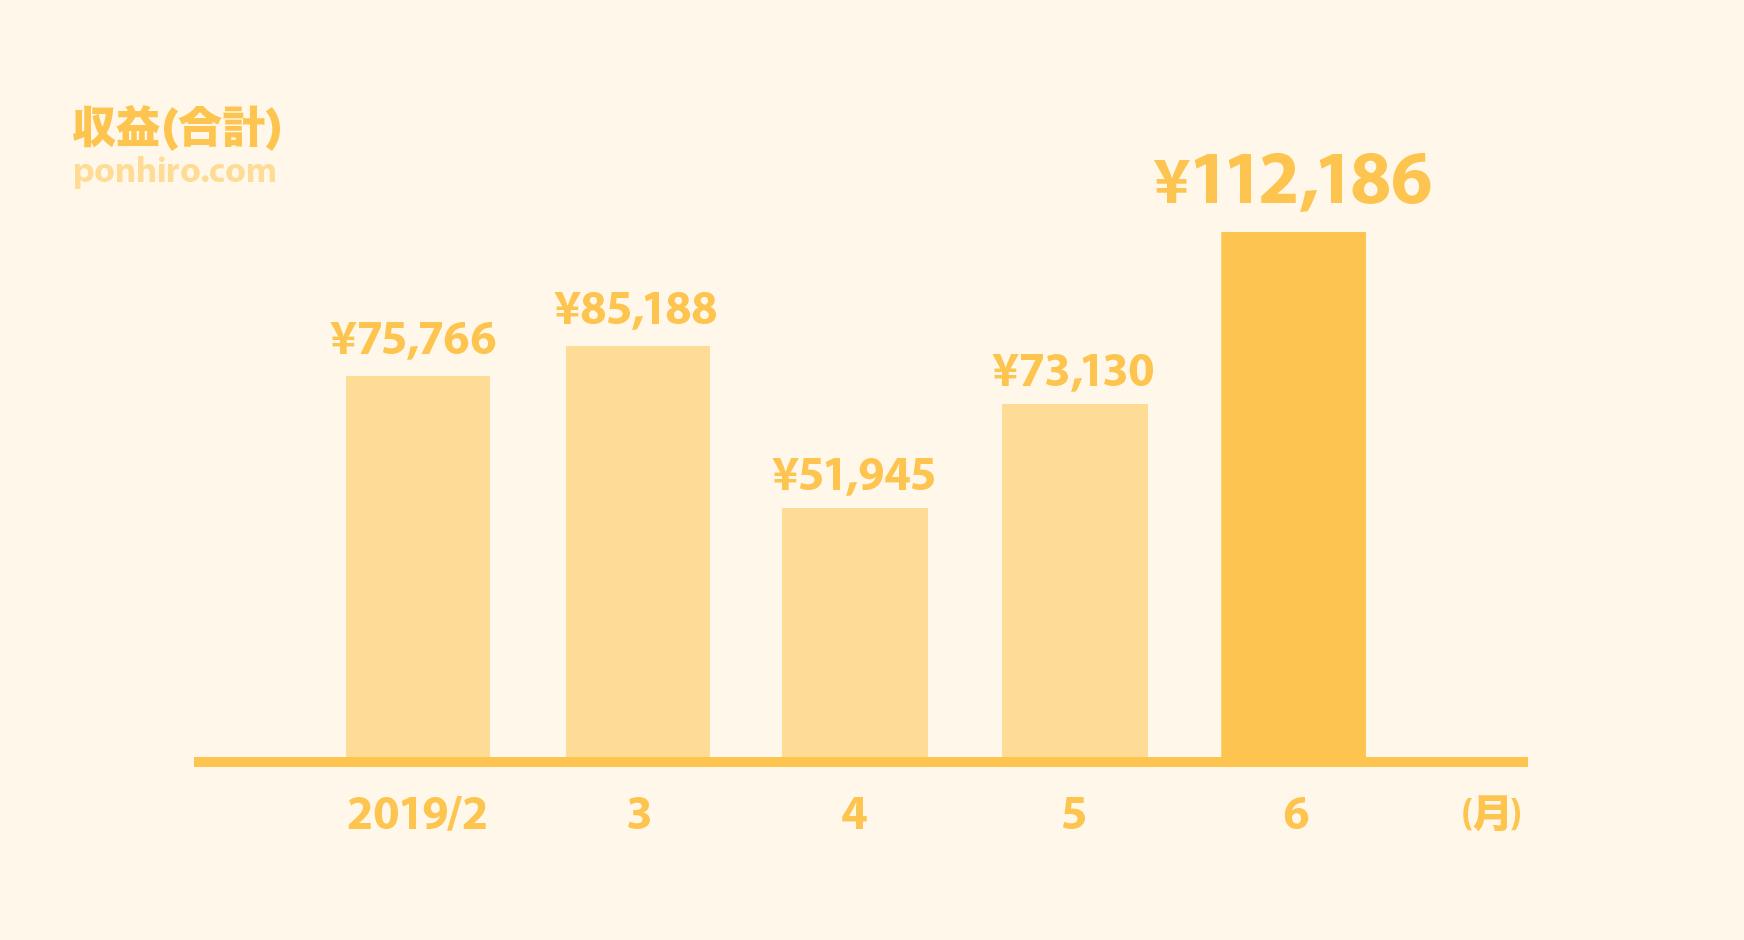 ブログ運営報告5ヶ月目-全体収益合計